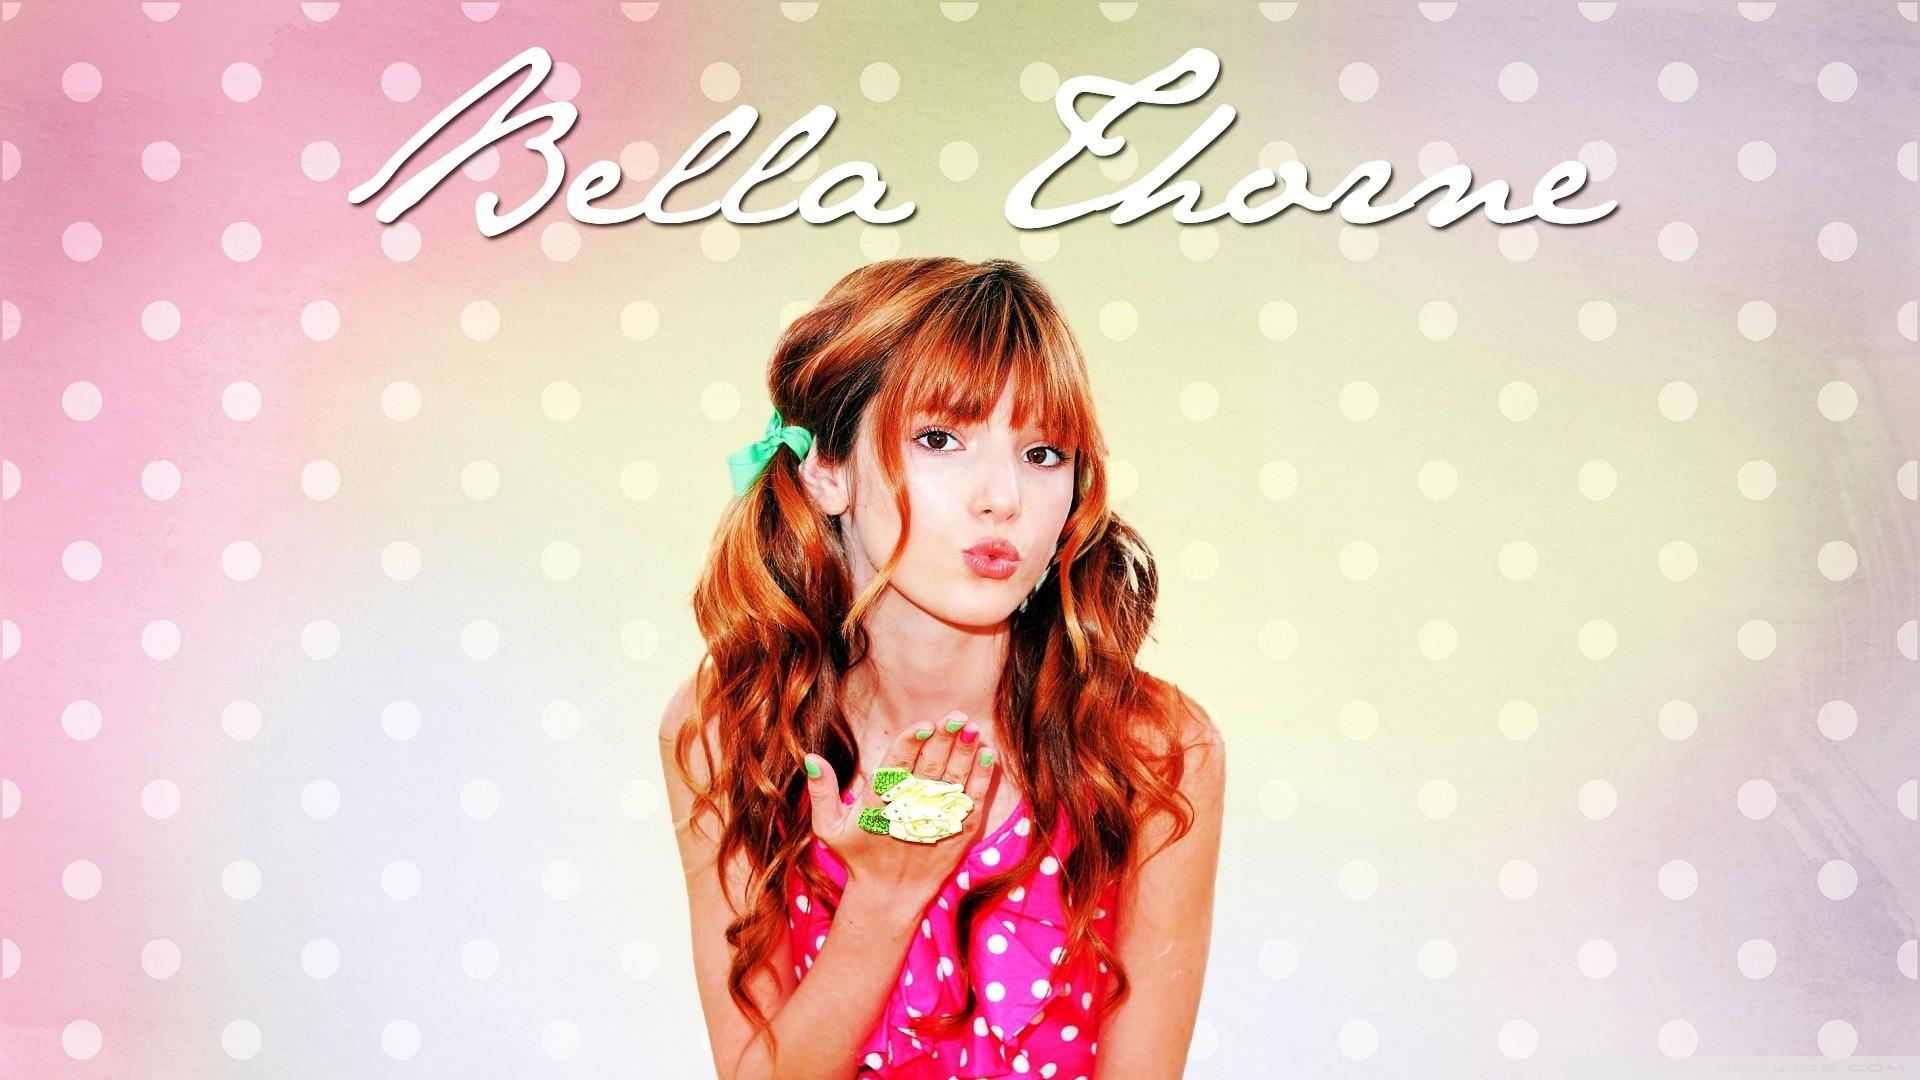 Bella Thorne Download Wallpaper